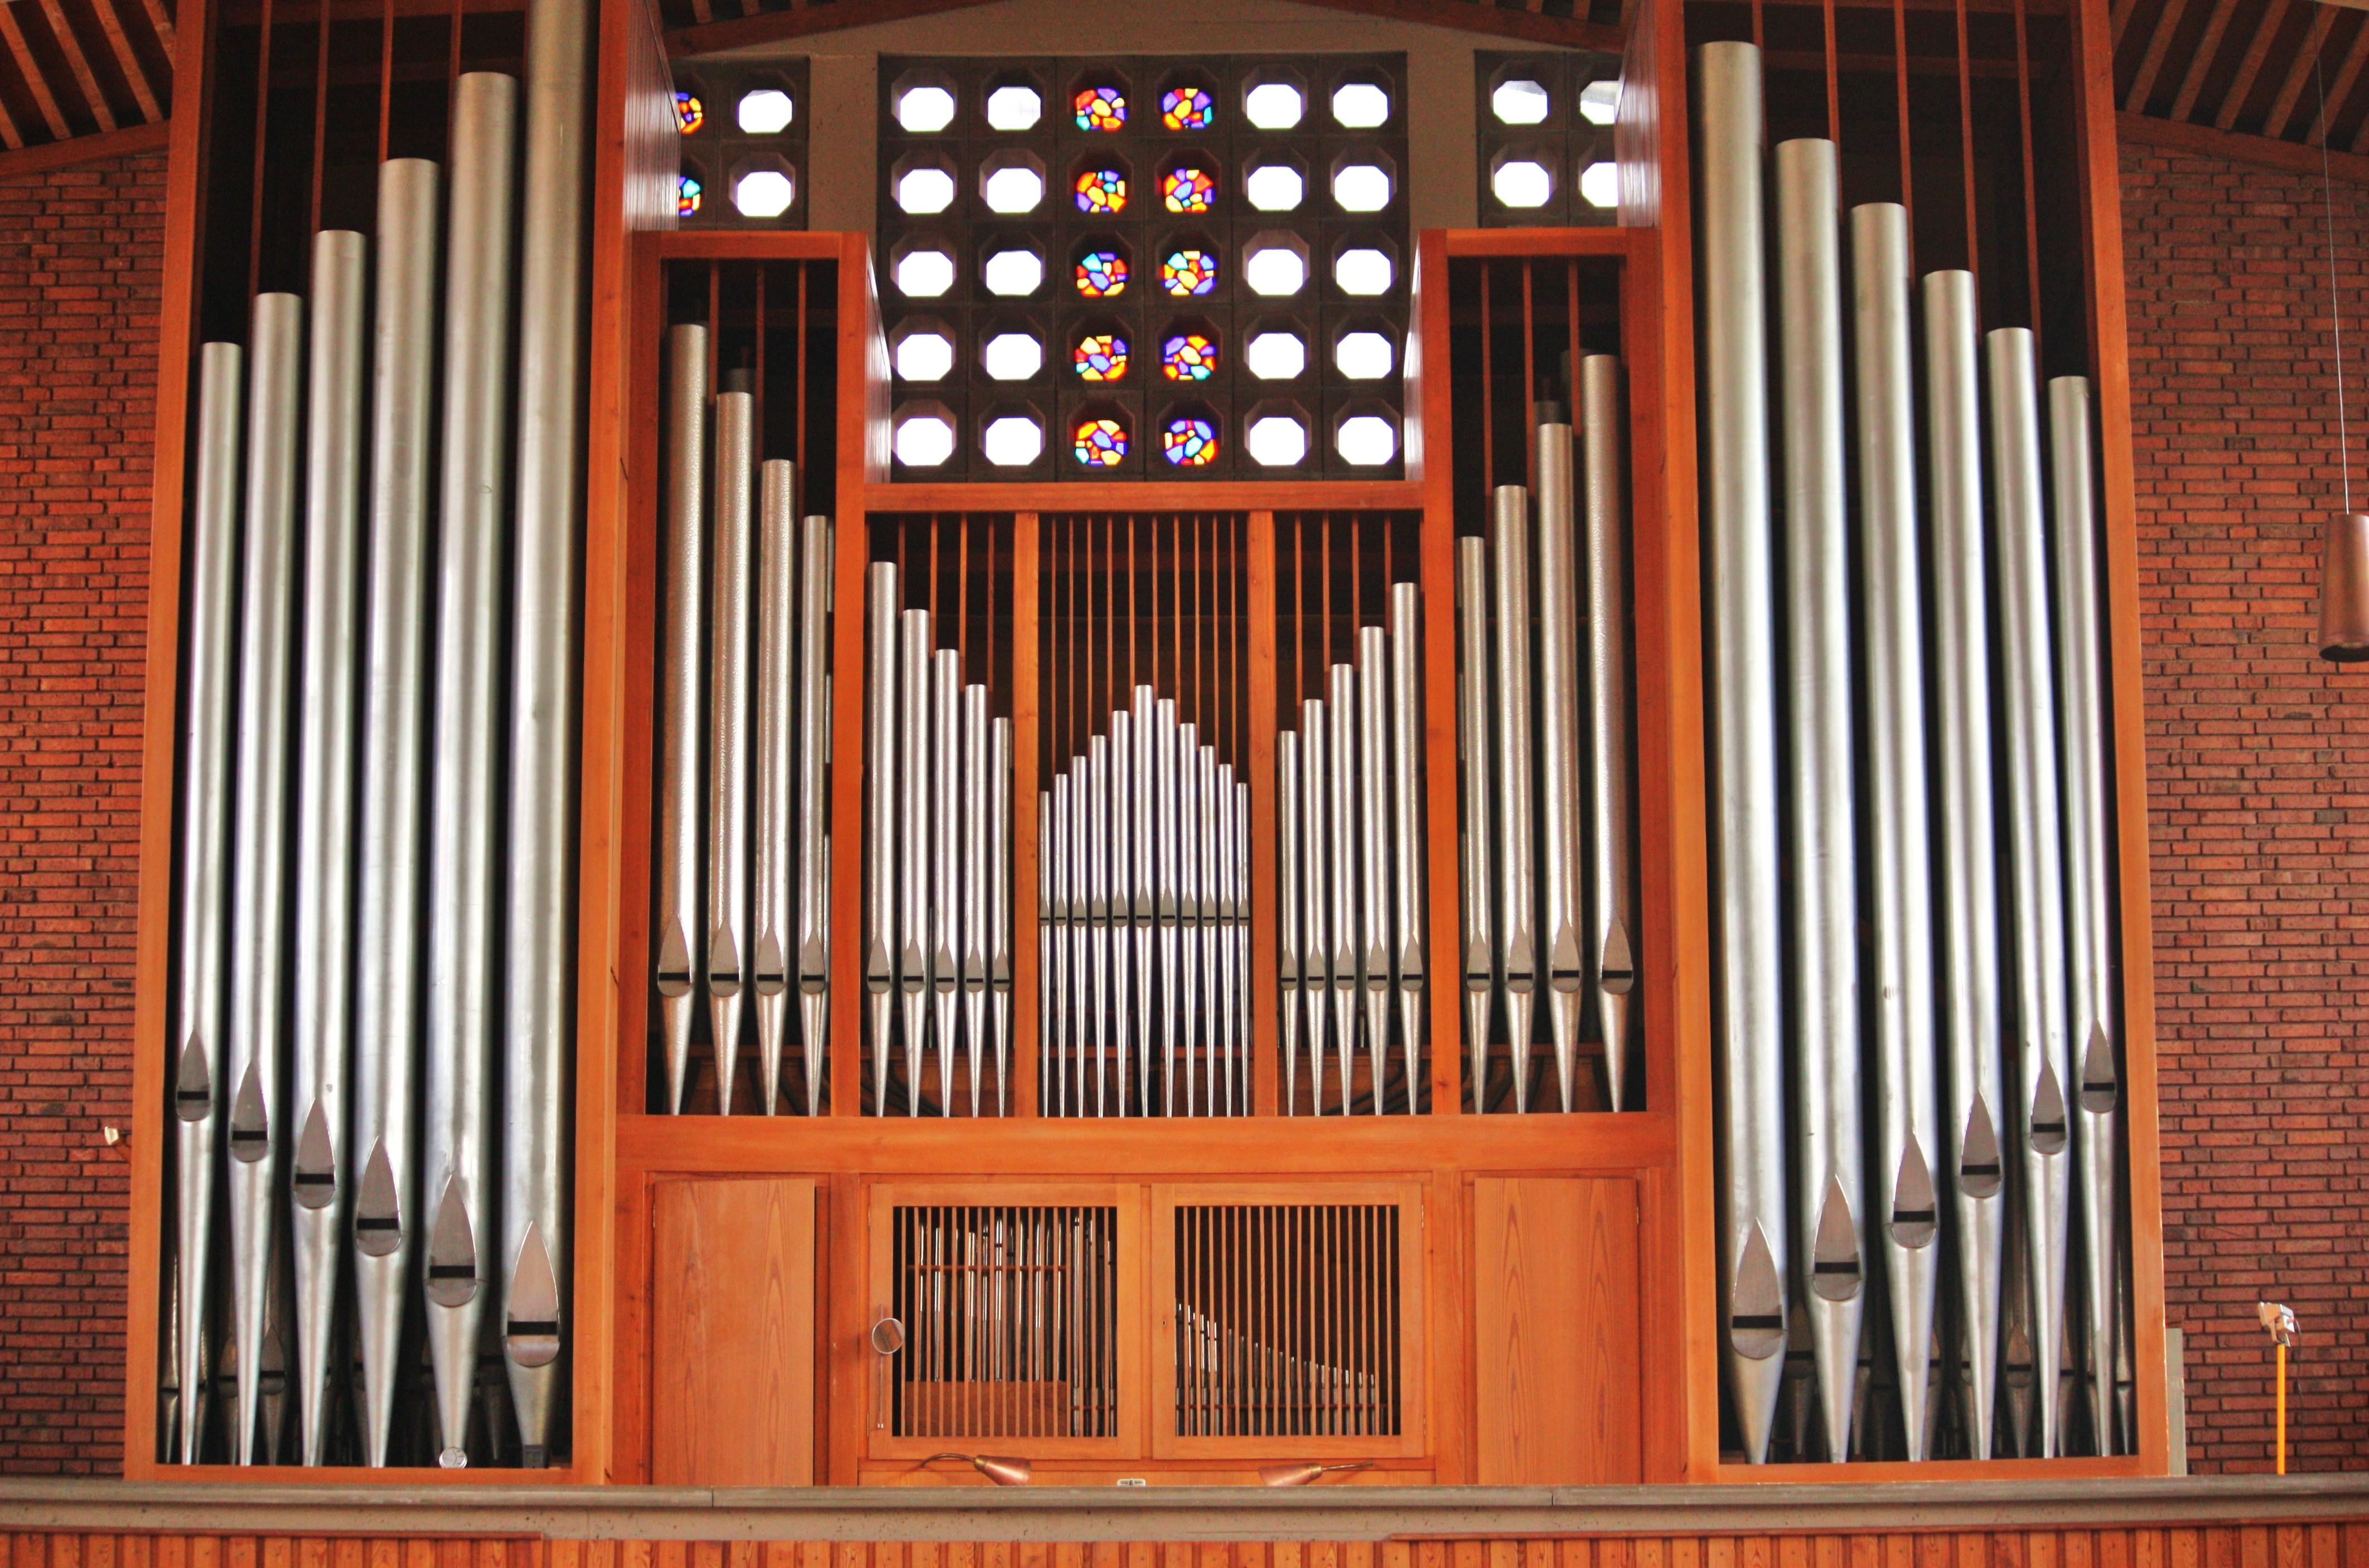 Die Beckerath-Orgel - Kirchengemeinde St. Andreas Nürnberg